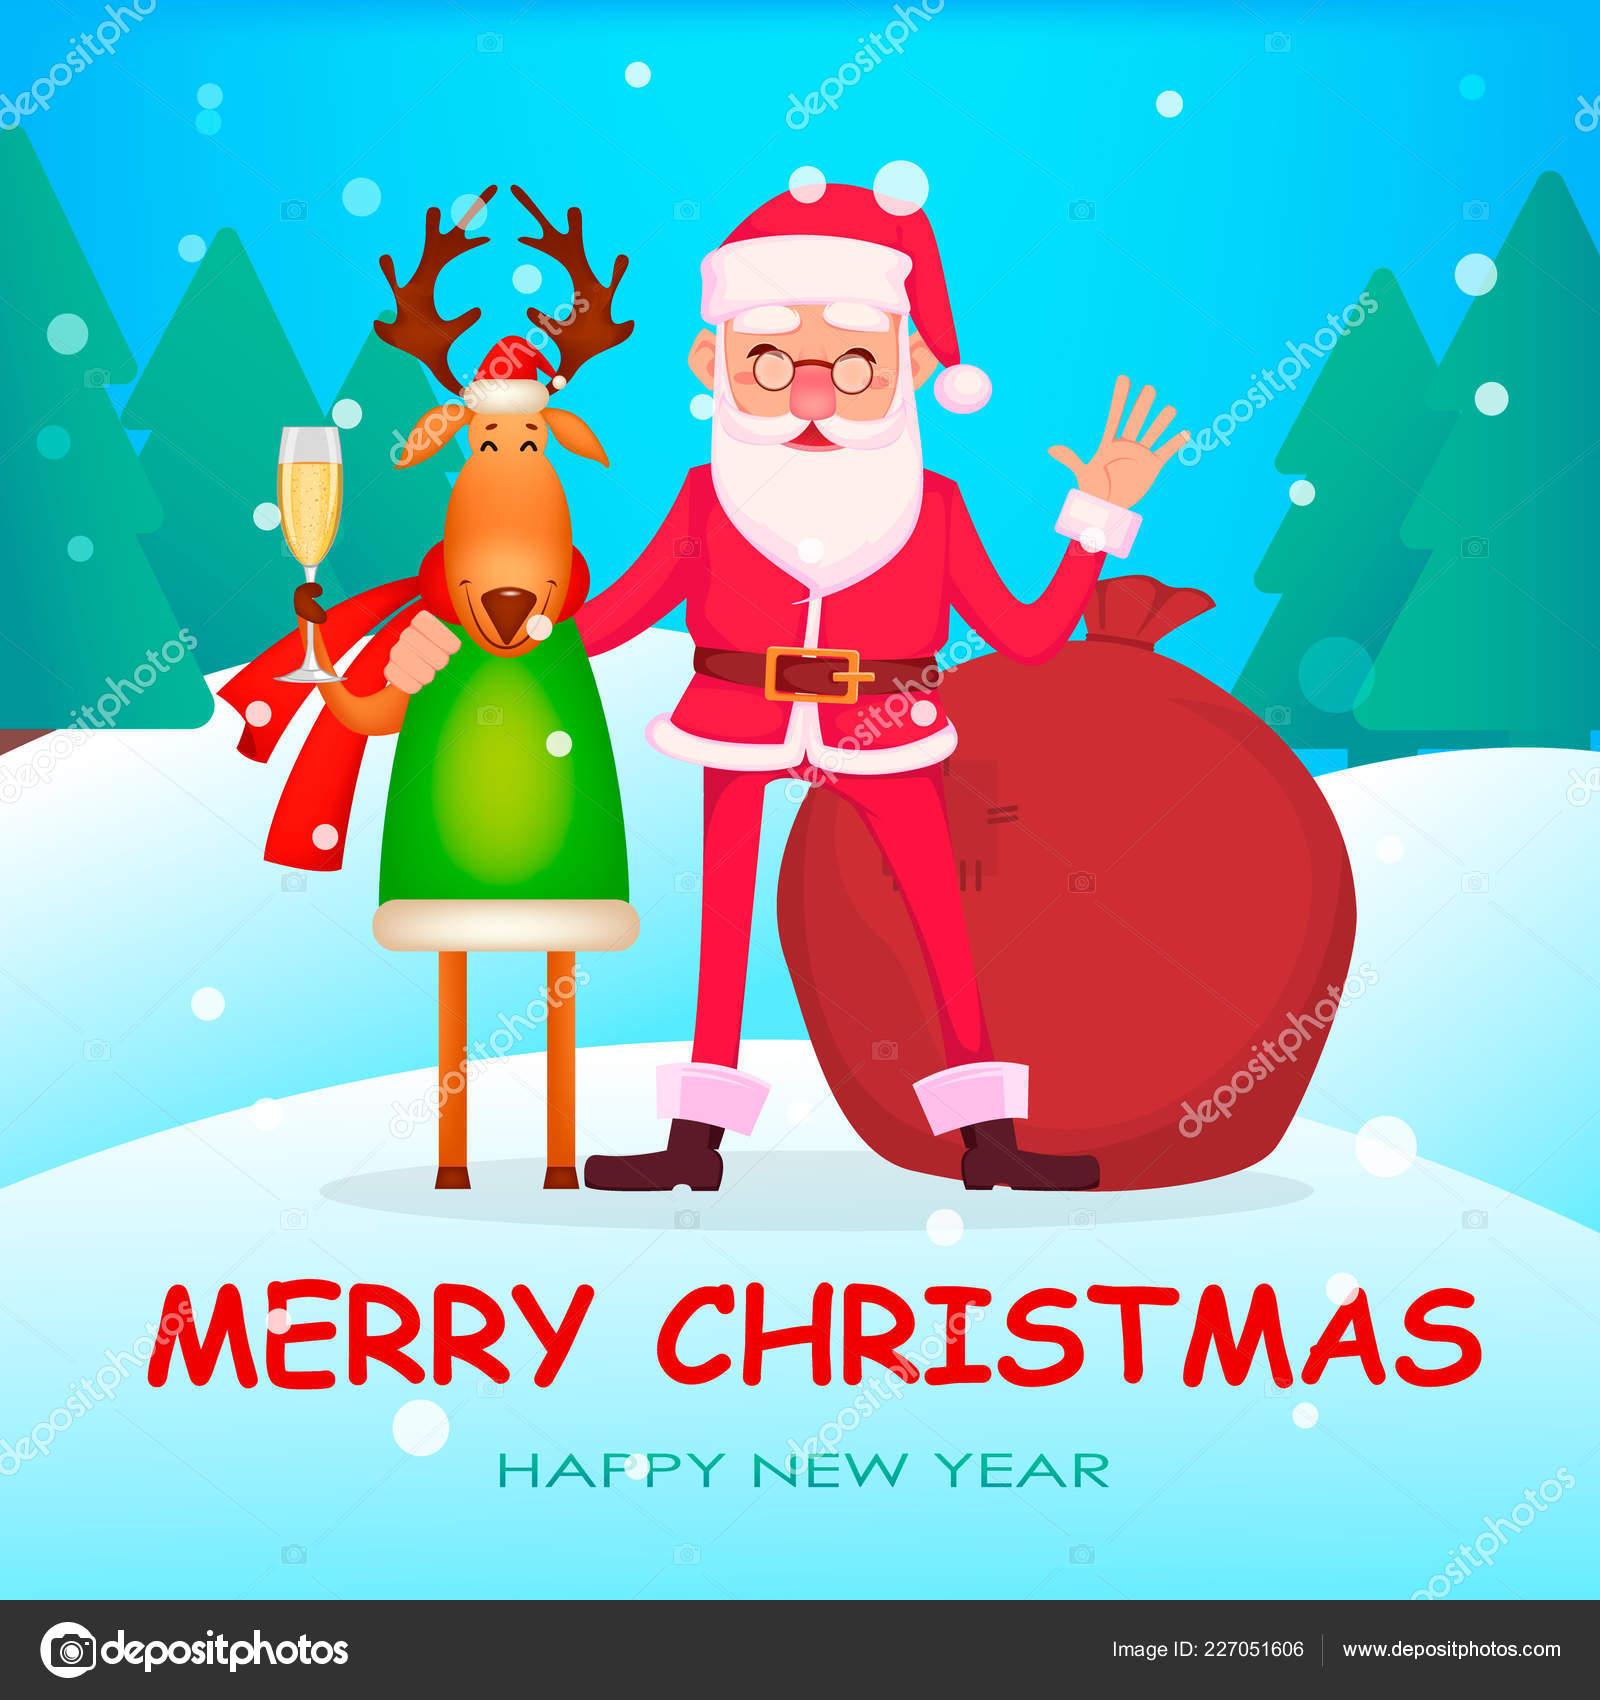 Christmas Greeting Card Funny Santa Claus Glasses Cheerful Cartoon ...